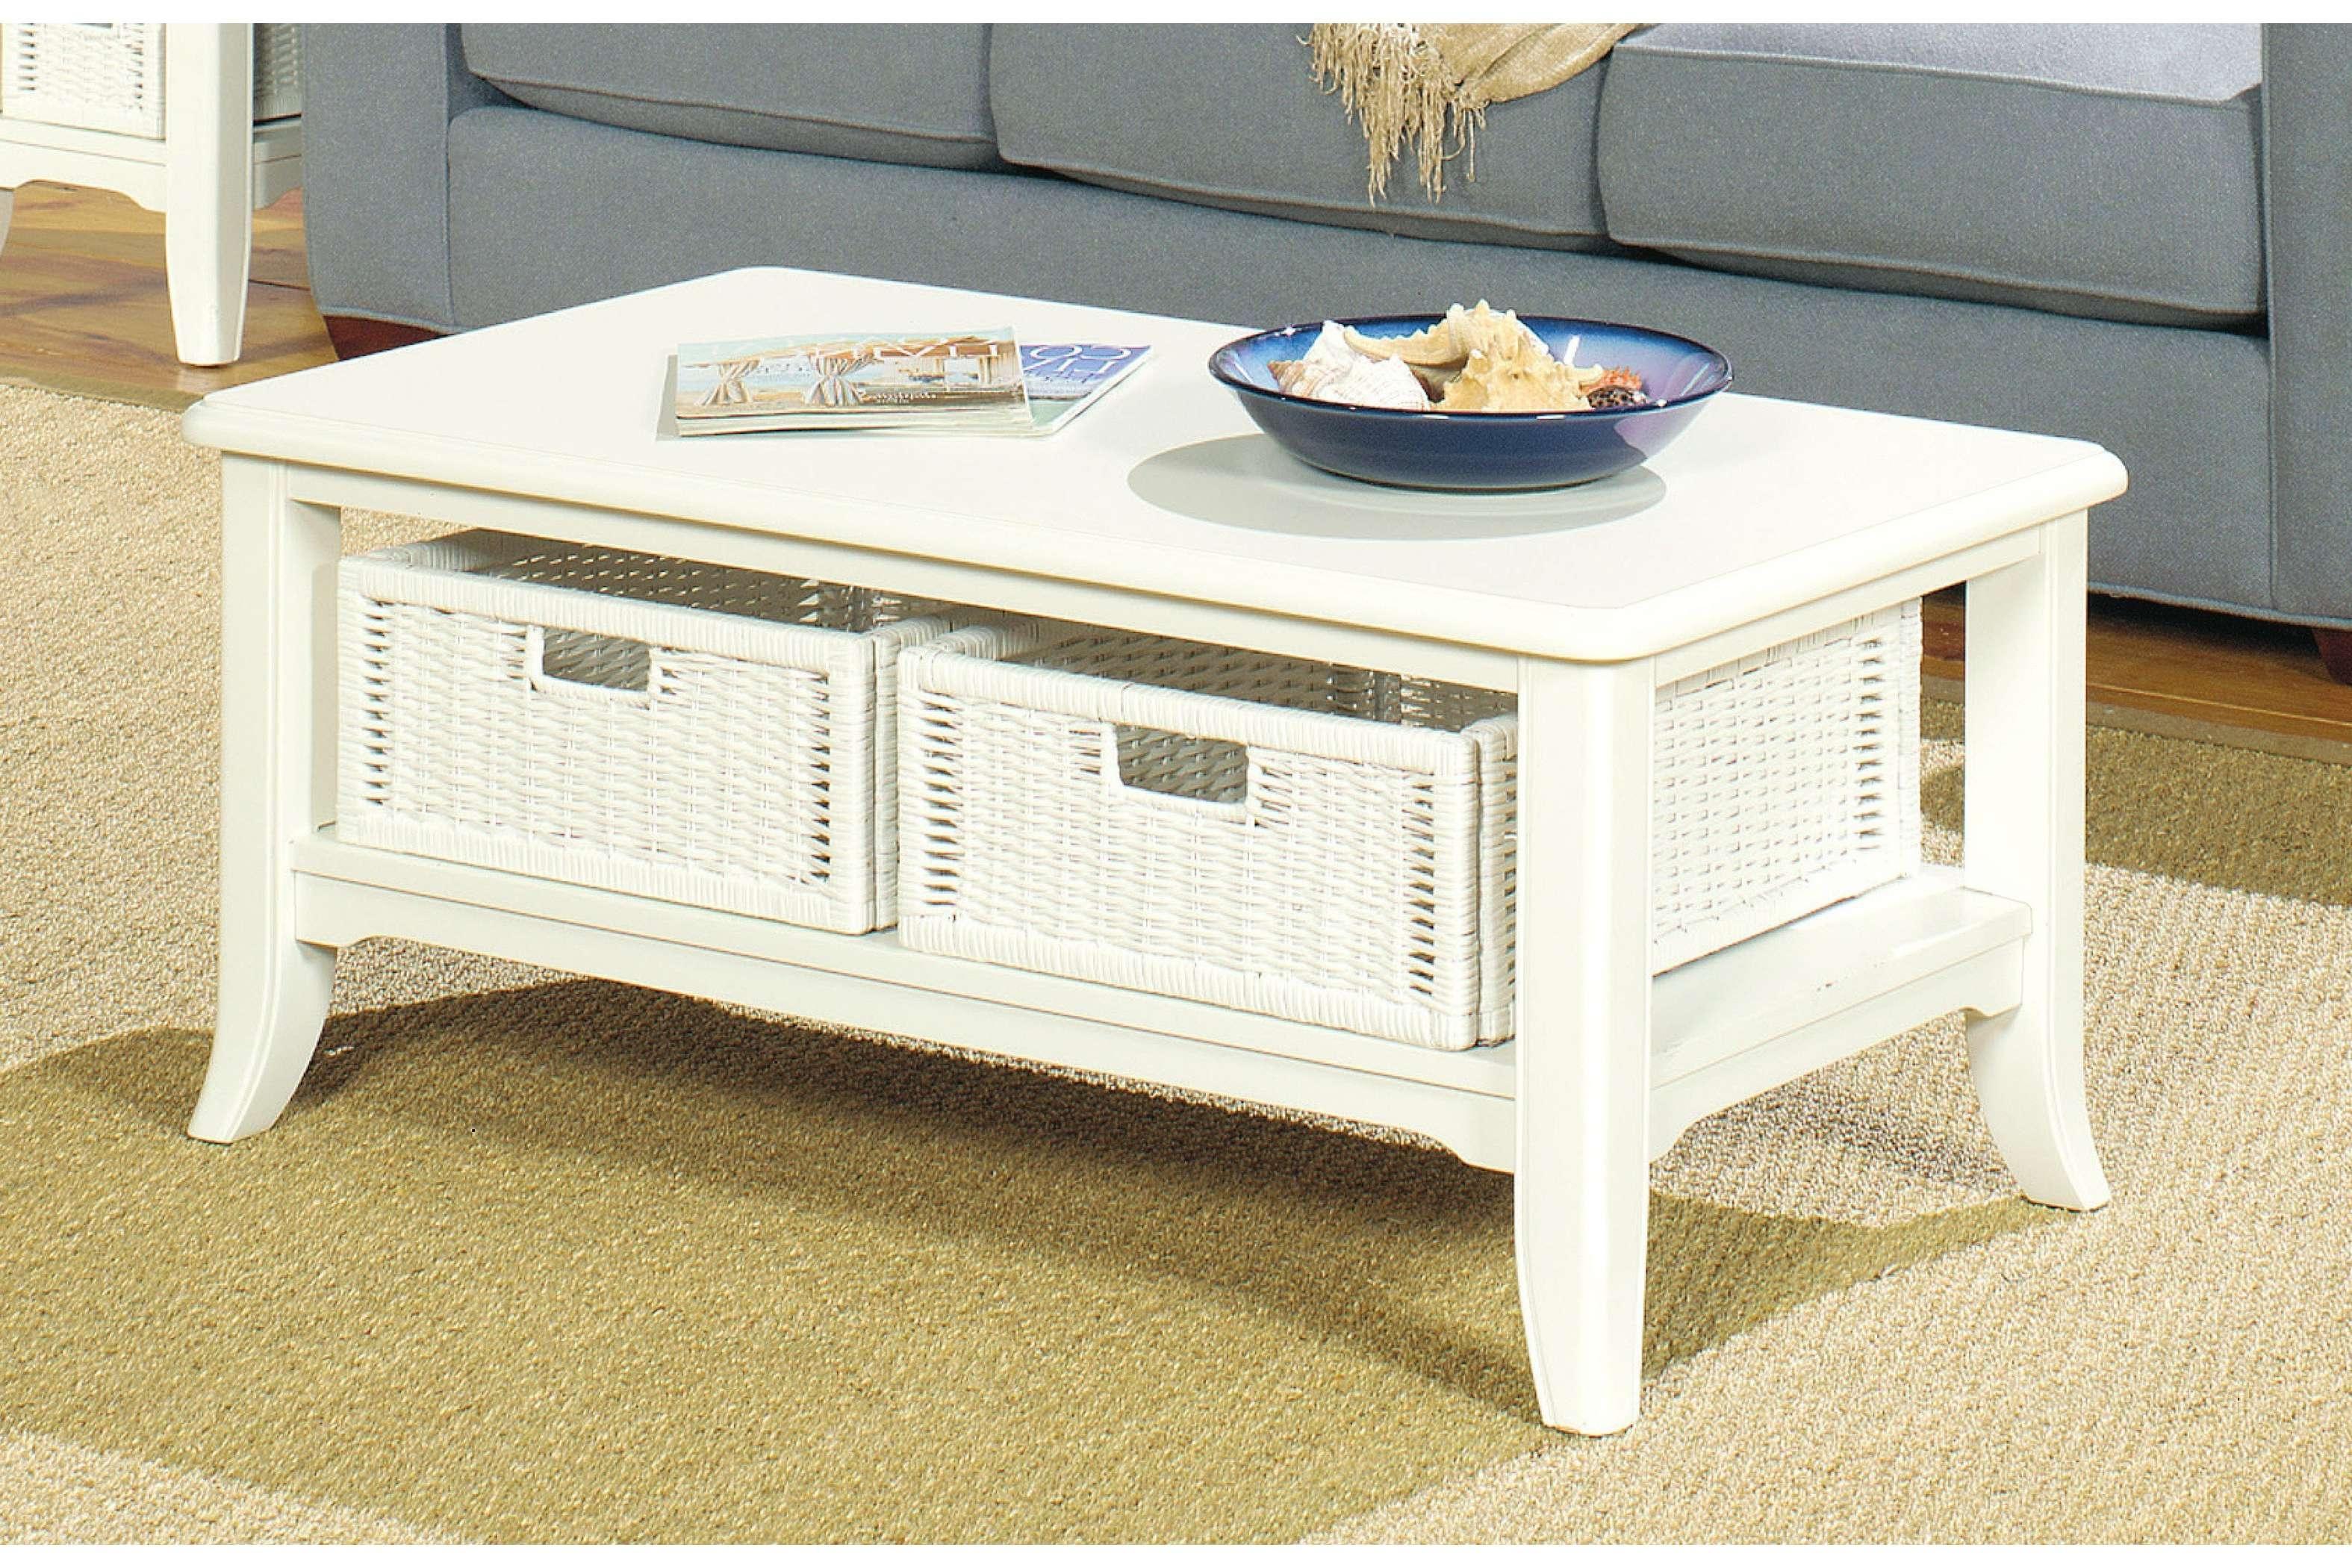 Coffee Tables With Wicker Basket Storage • Coffee Table Ideas With Newest Coffee Table With Wicker Basket Storage (View 11 of 20)